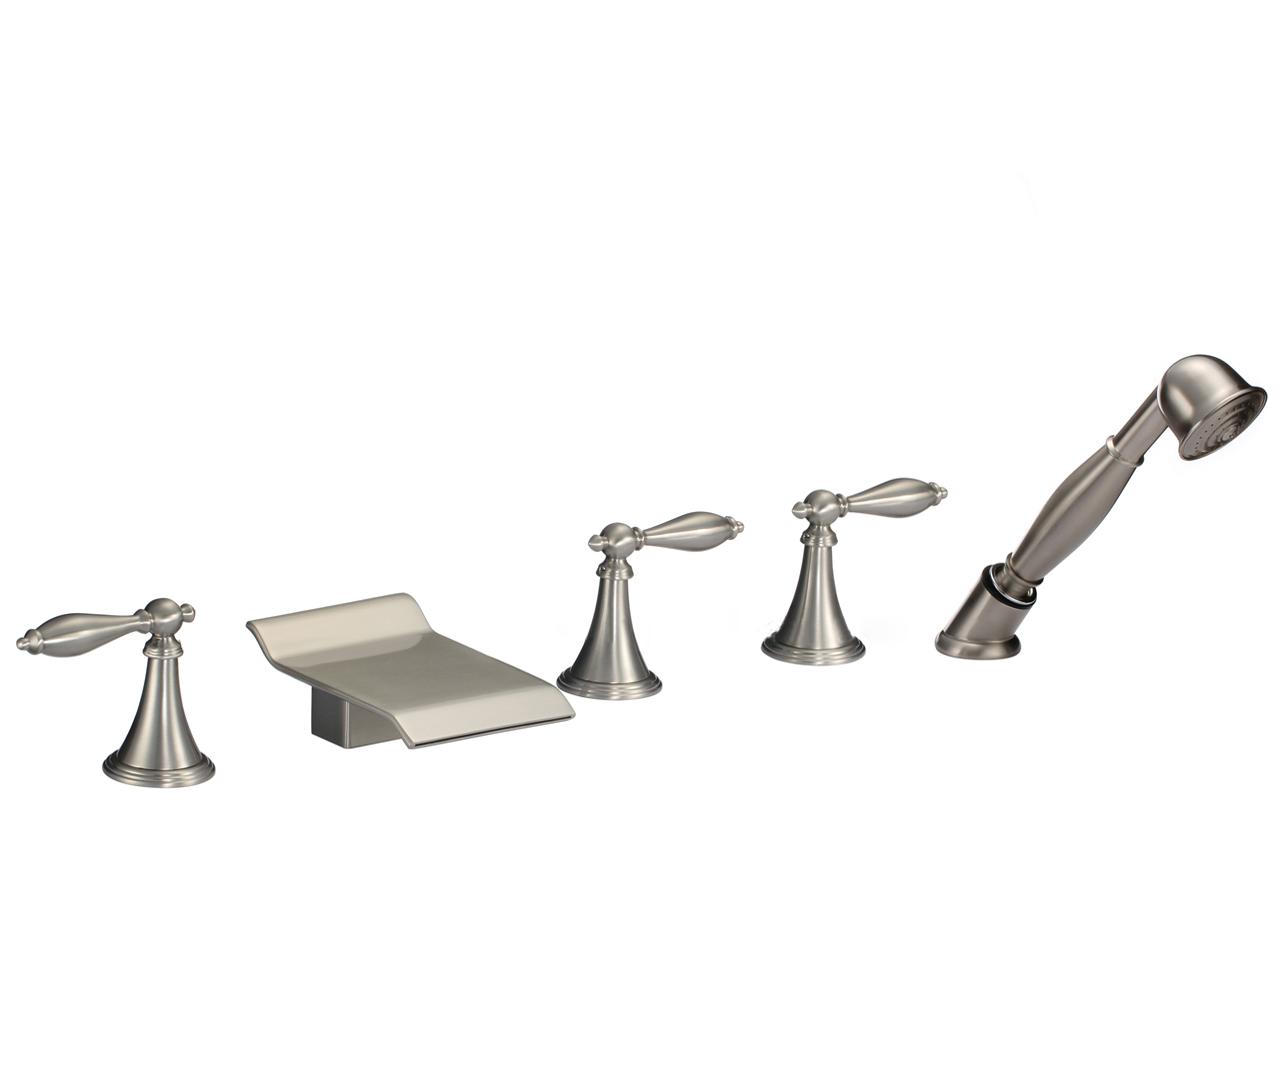 Amiens Triple Handle Solid Brass Bathroom Sink Faucet